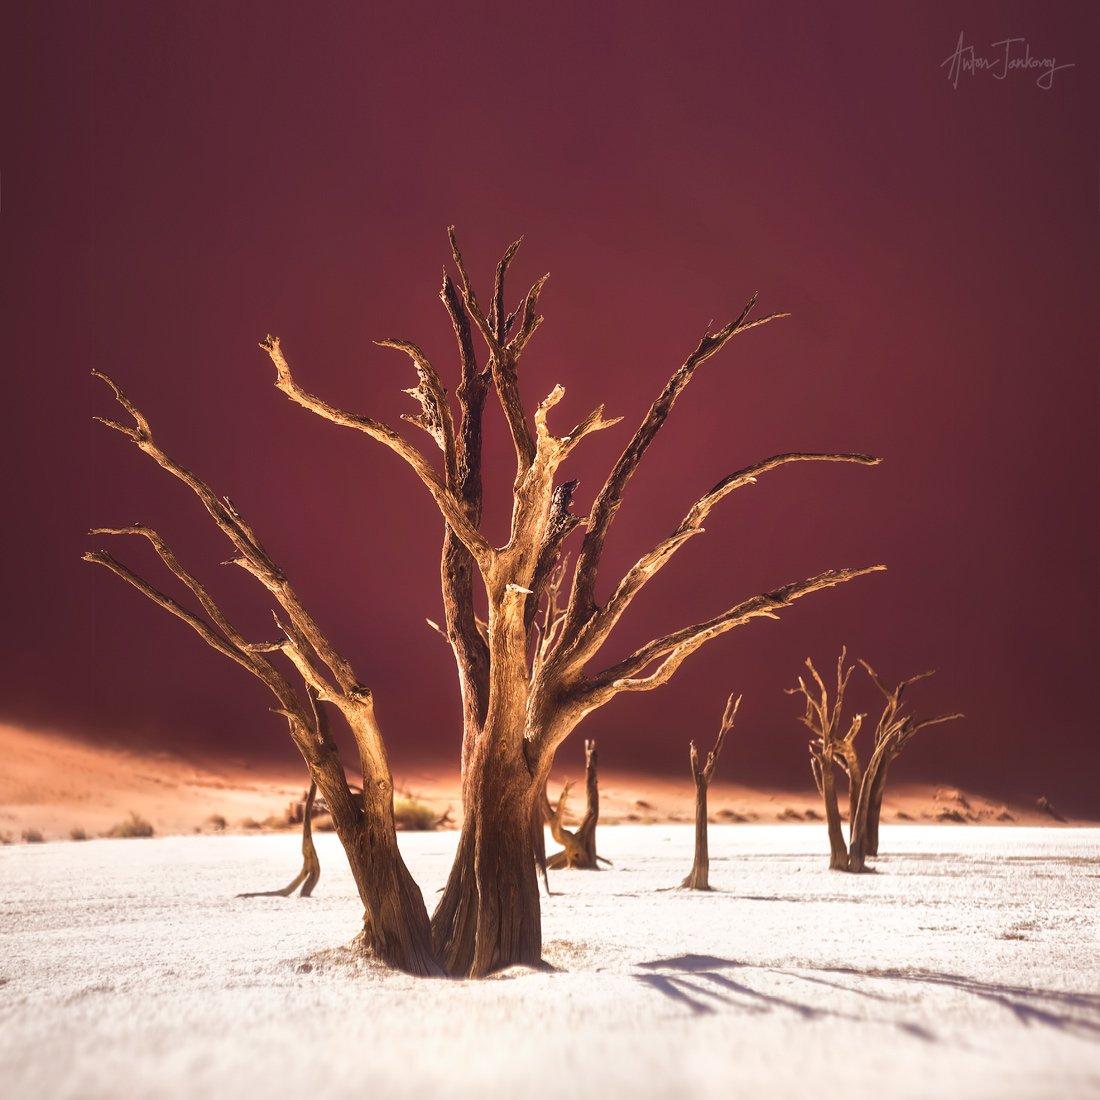 Tree, Sossusvlei, Deadvlei, Namibia, valley, Desert, Namib, sand, dune, dead  Дерево, мертвая долина, Намибия, Намиб, пустыня, дюны, песок, плато, Антон Янковой (www.photo-travel.com)